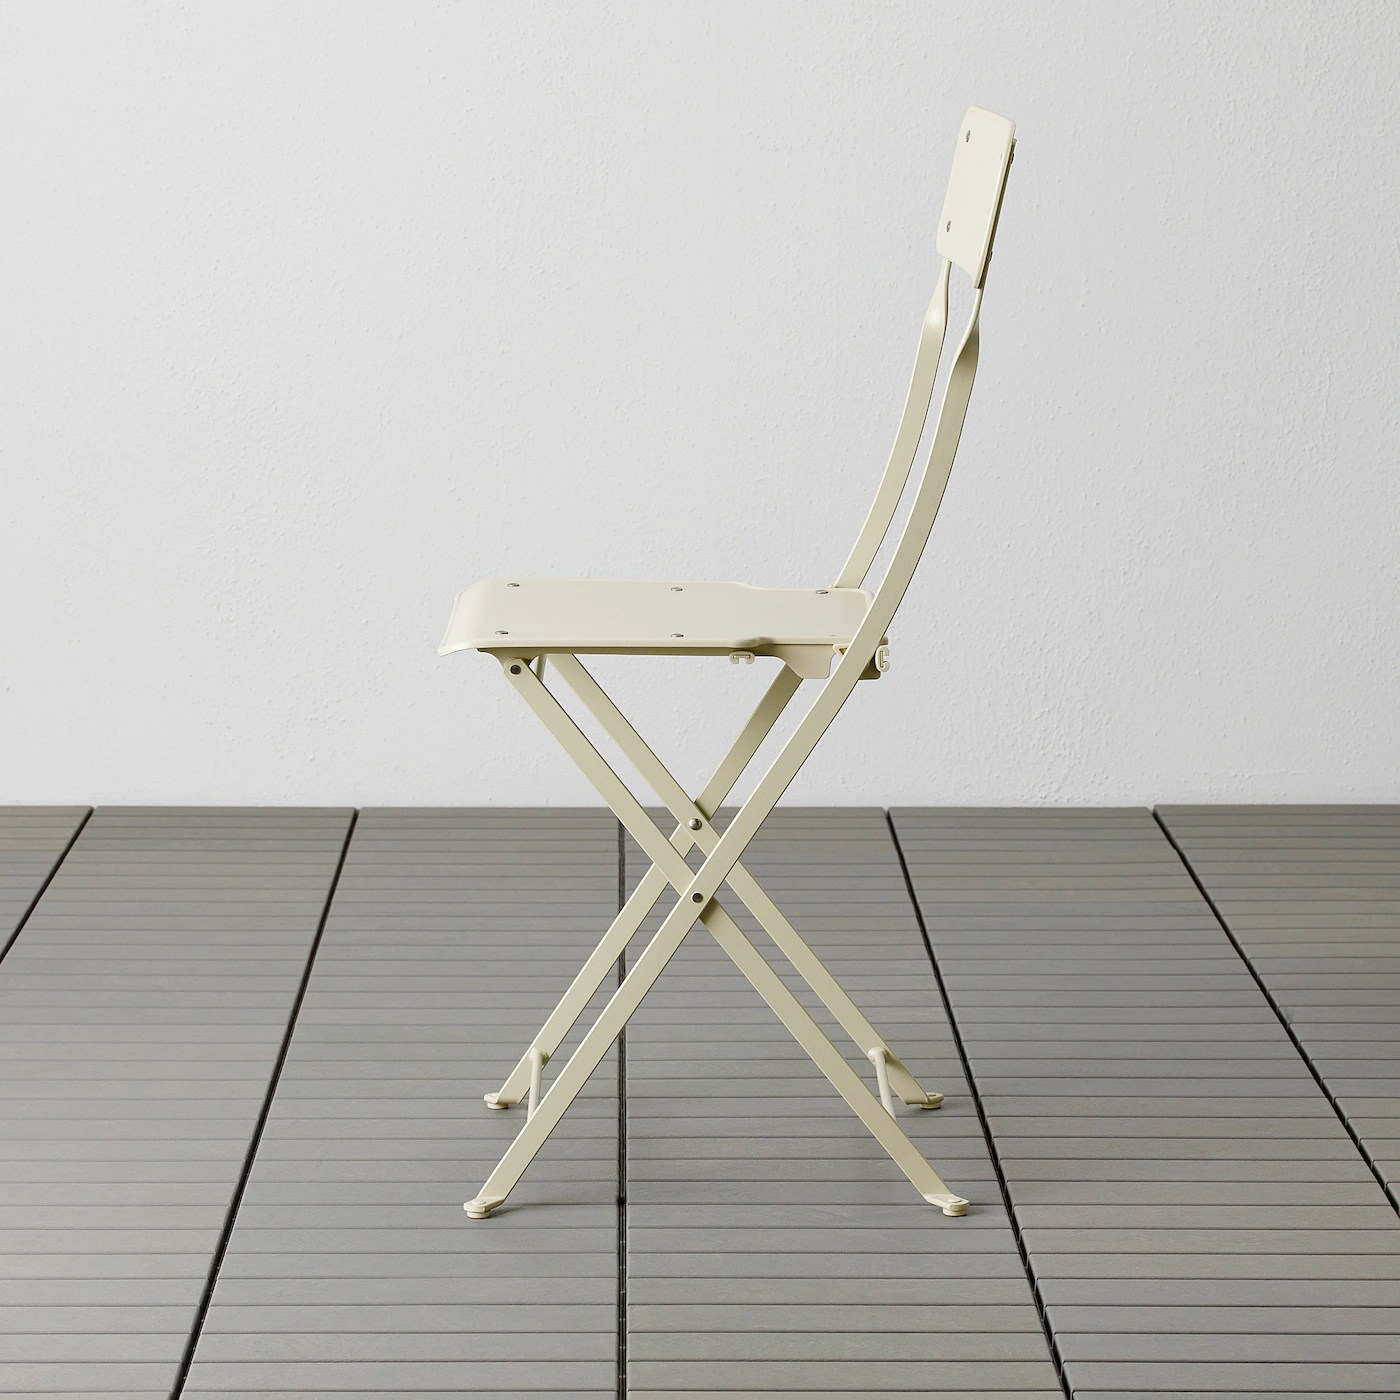 saltholmen chair outdoor foldable beige